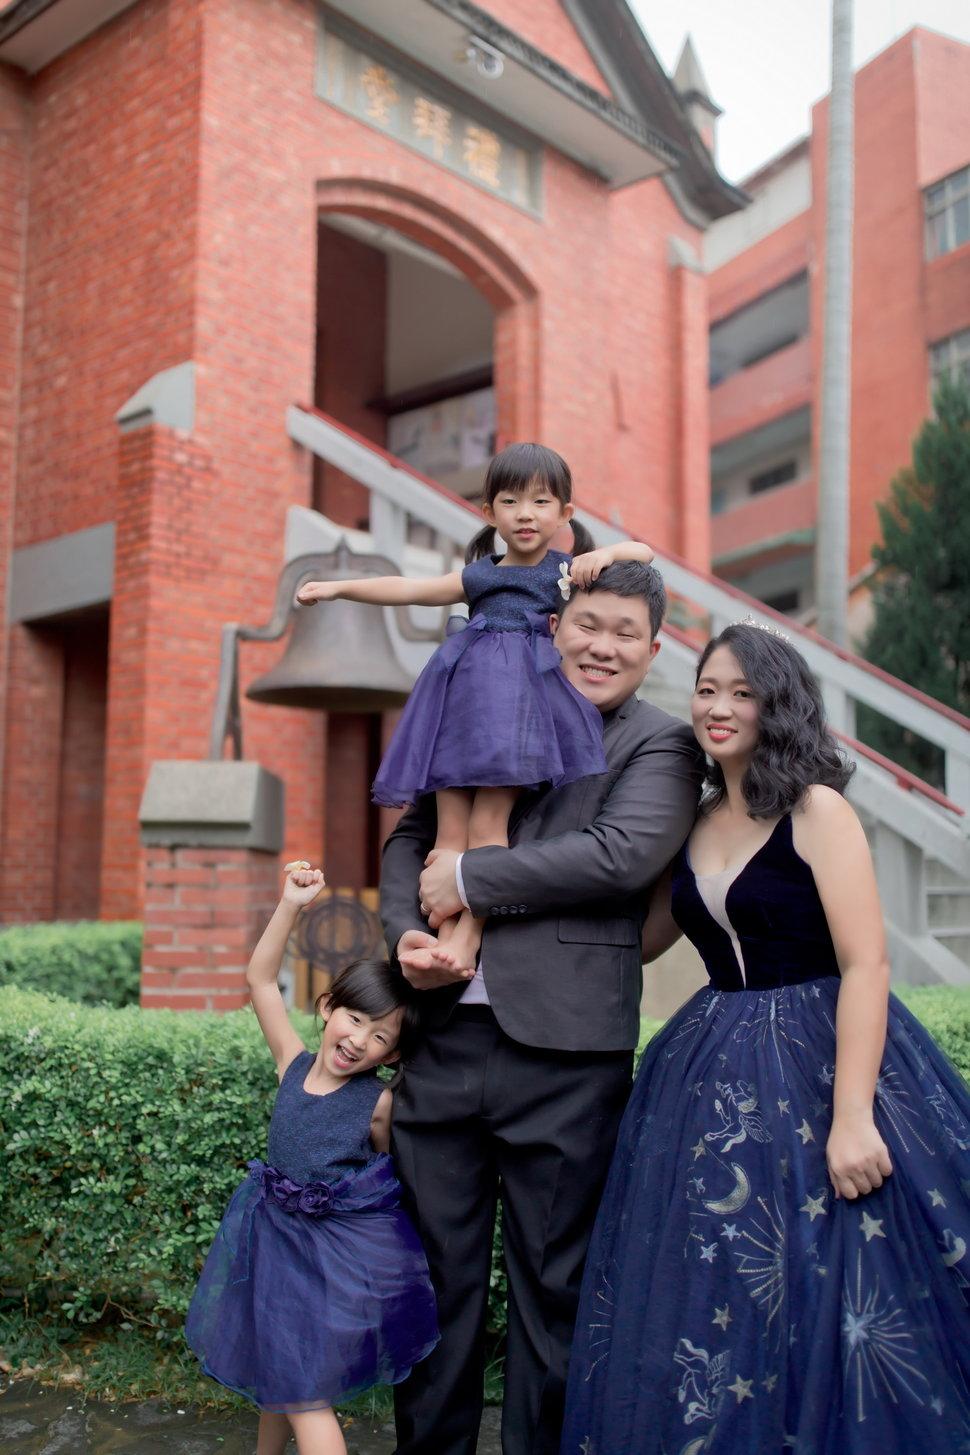 PP_0251_調整大小 - 巴黎婚紗攝影台灣總店《結婚吧》